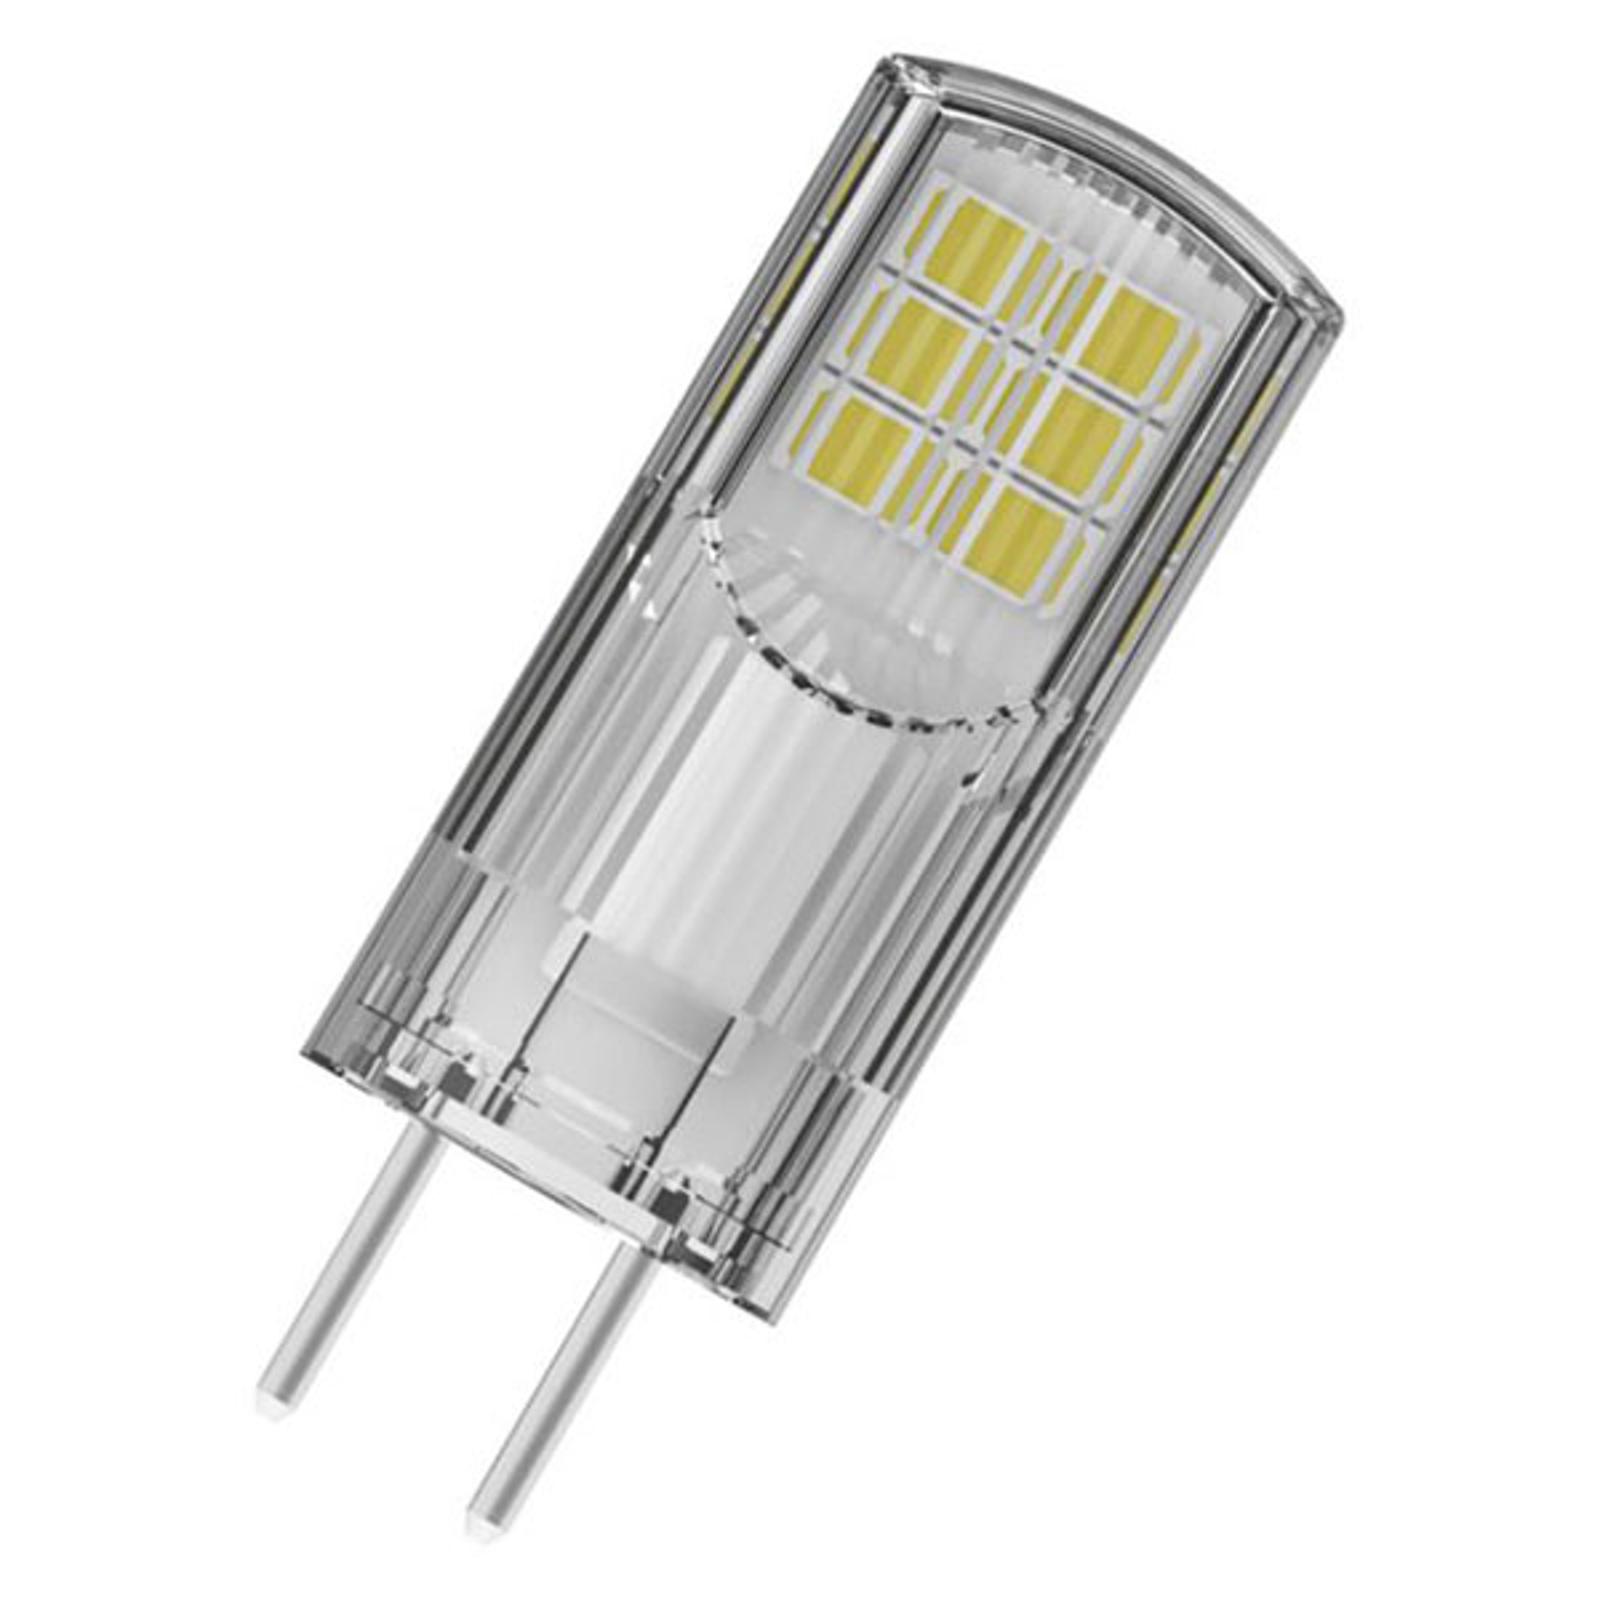 LED-stiftpære 300° GY6,35 2,6W, varmhvid, 300 lm